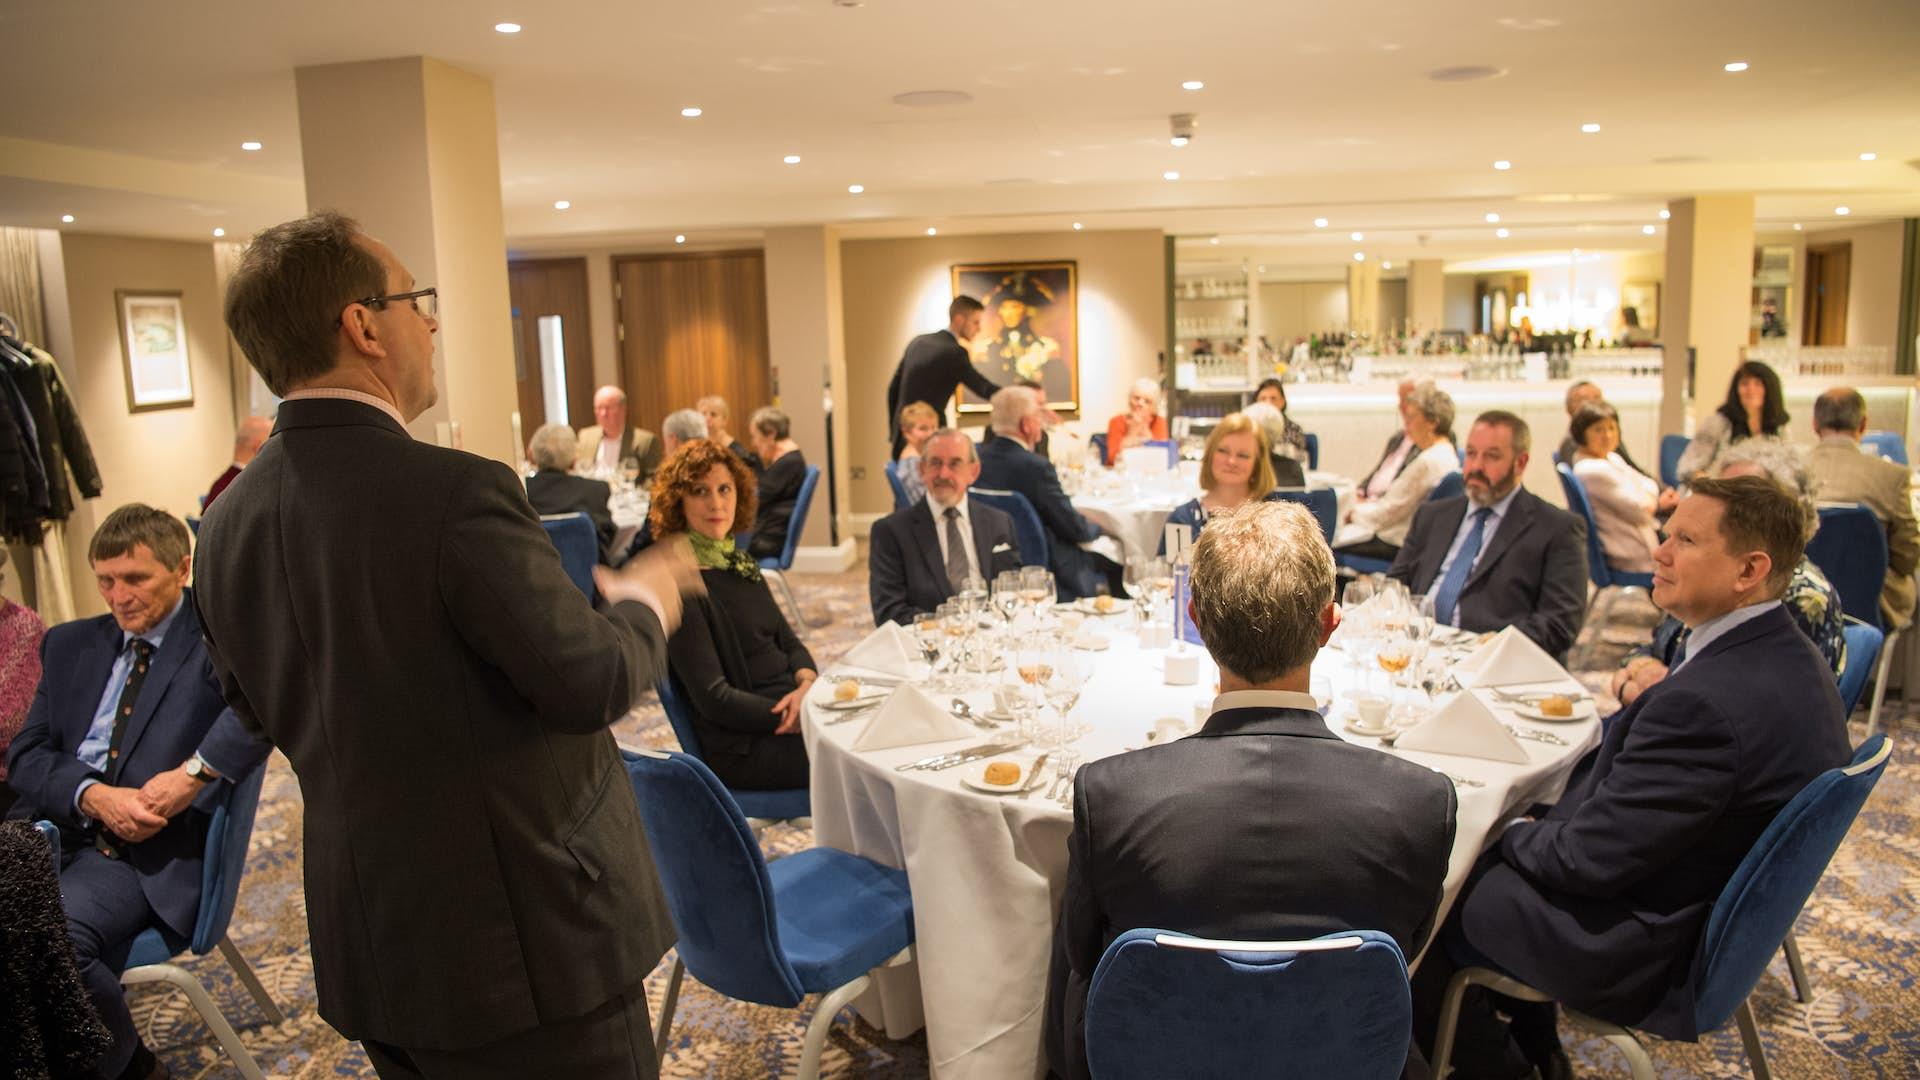 Trafalgar Room Events Victory Services Club